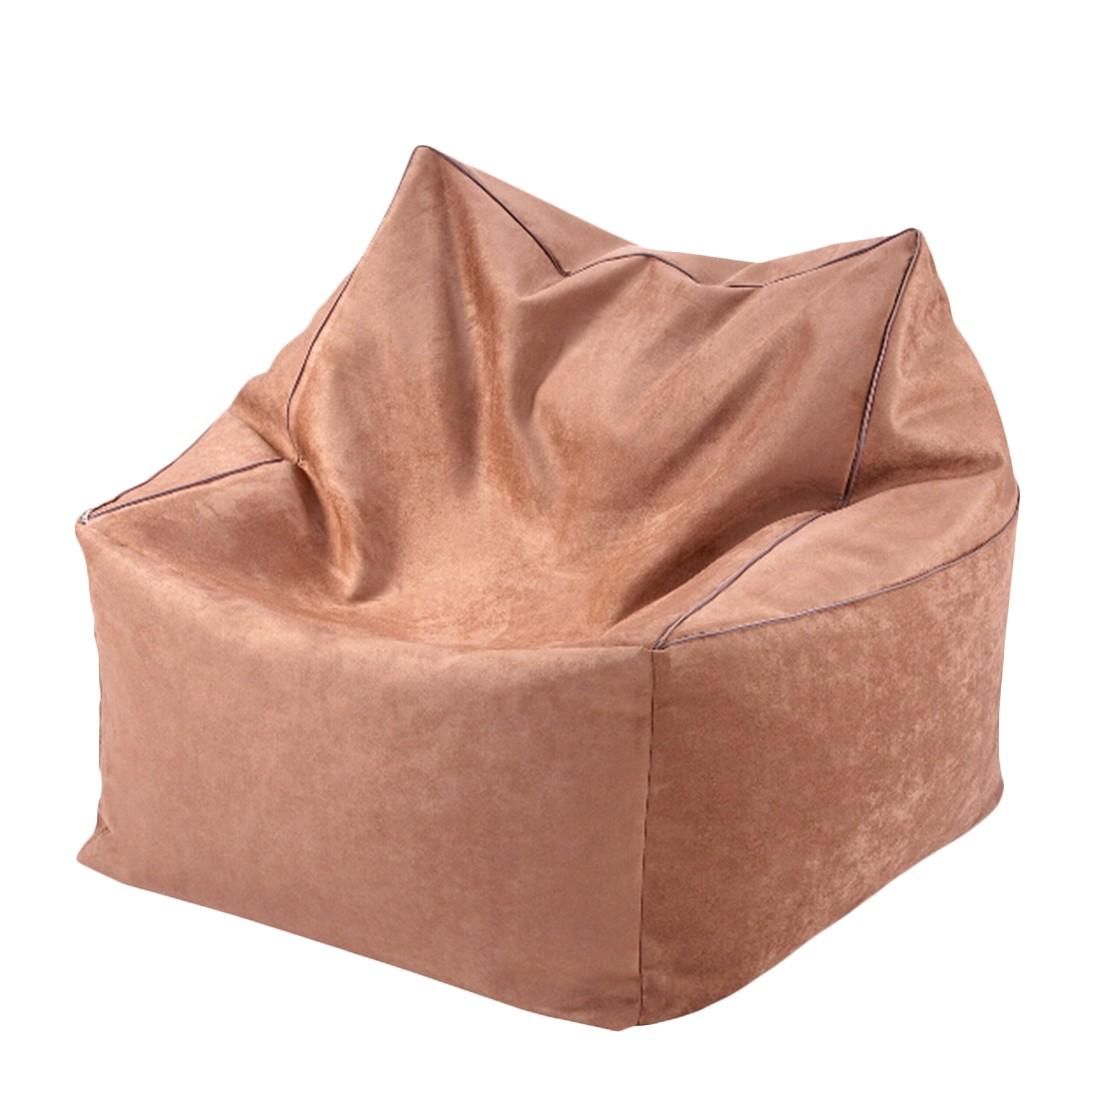 Sitzwürfel 2 in 1Microvelour ALKA espresso – 70 x 70 cm, KC-Handel online kaufen